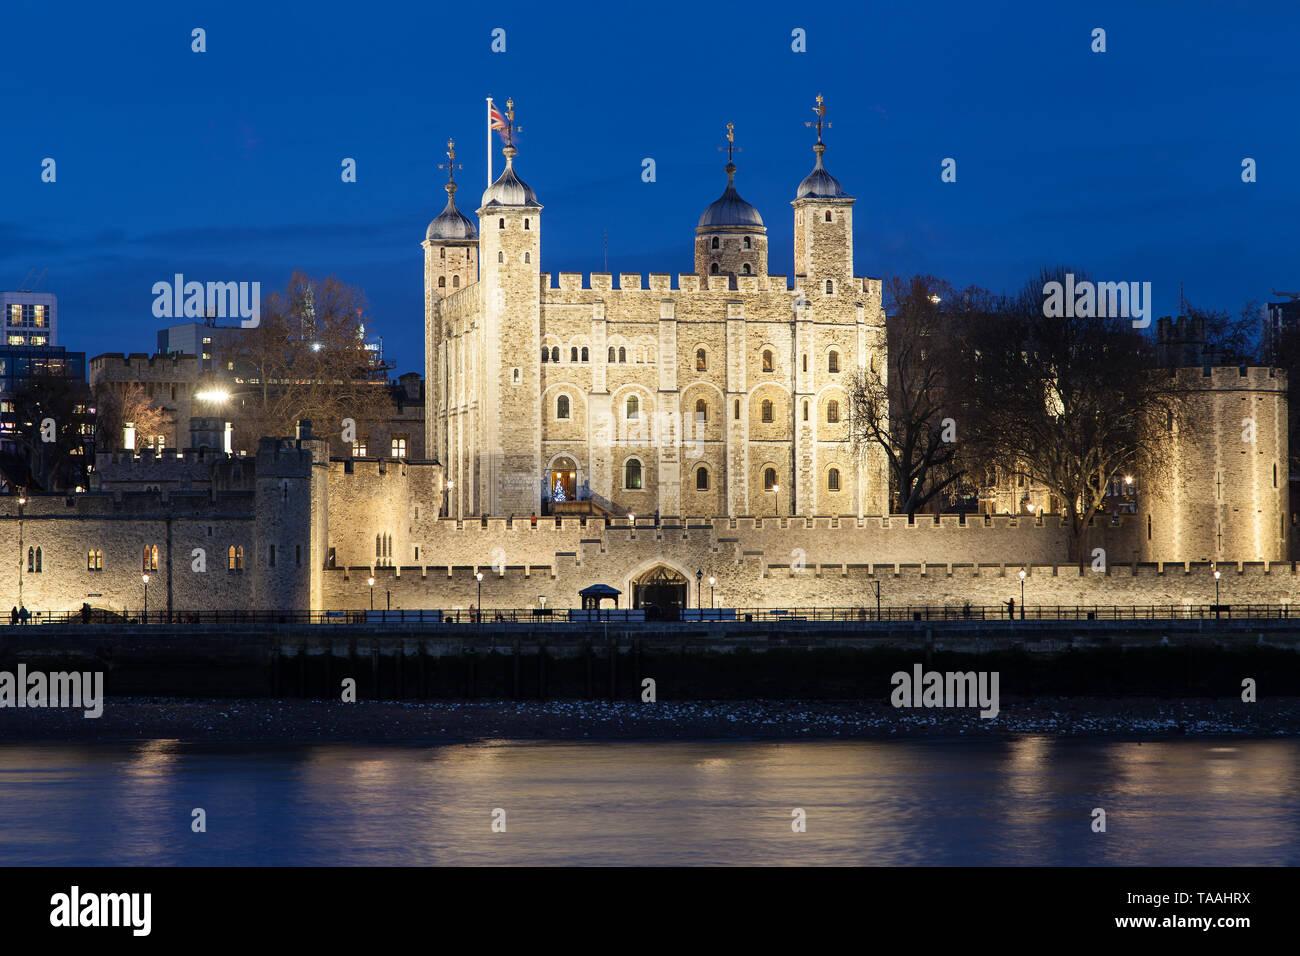 Tower of London at night, United Kingdom. Stock Photo